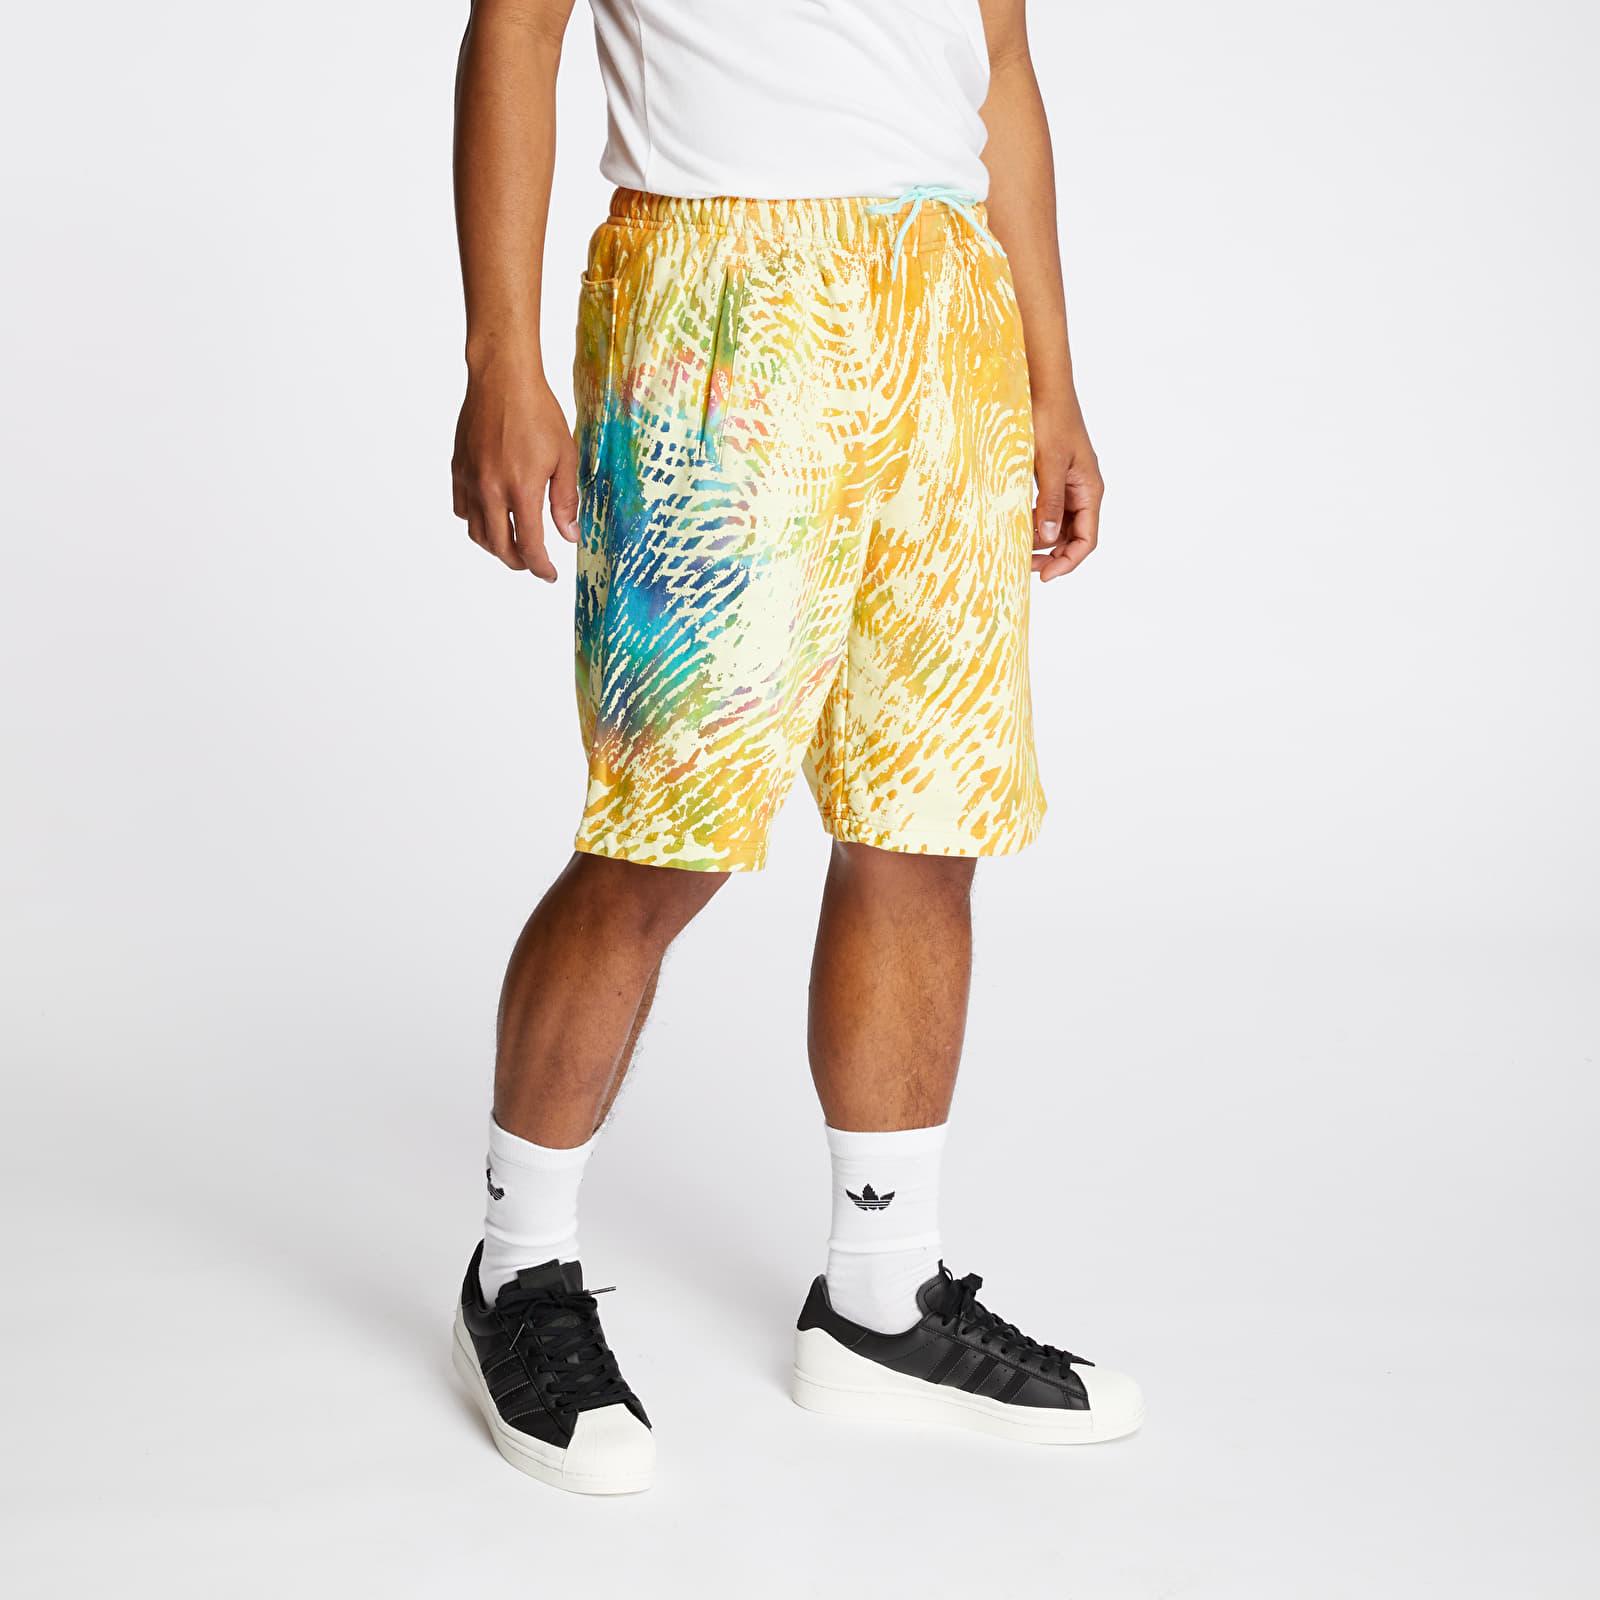 adidas x Pharrell Williams March Madness Fan Shorts